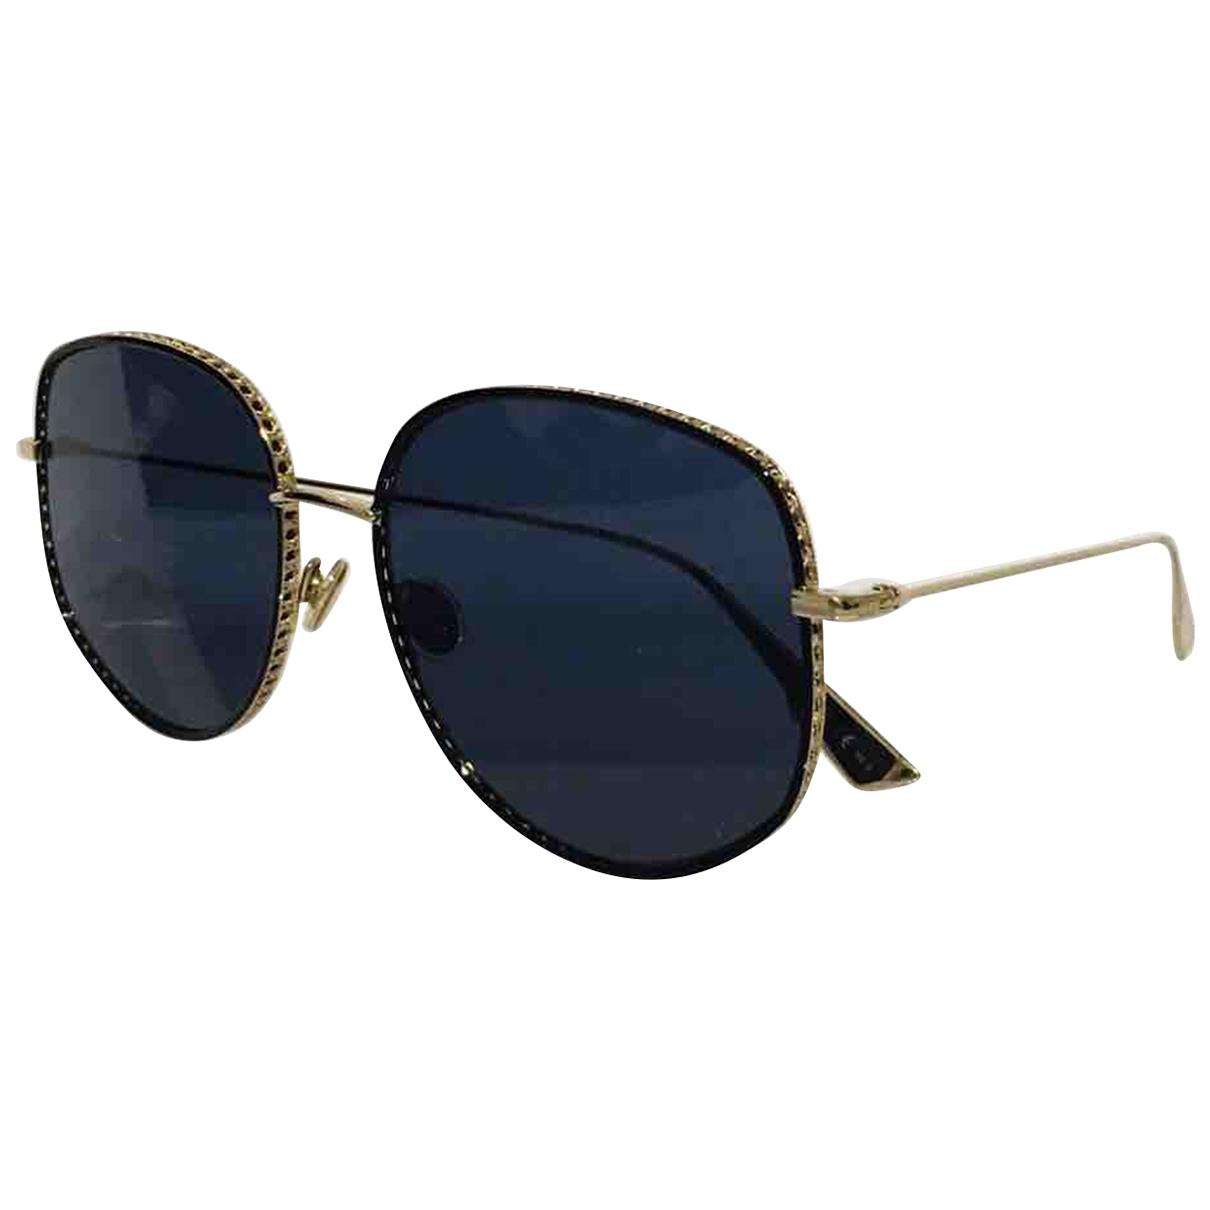 Gafas oversize Diorbydior2 Dior